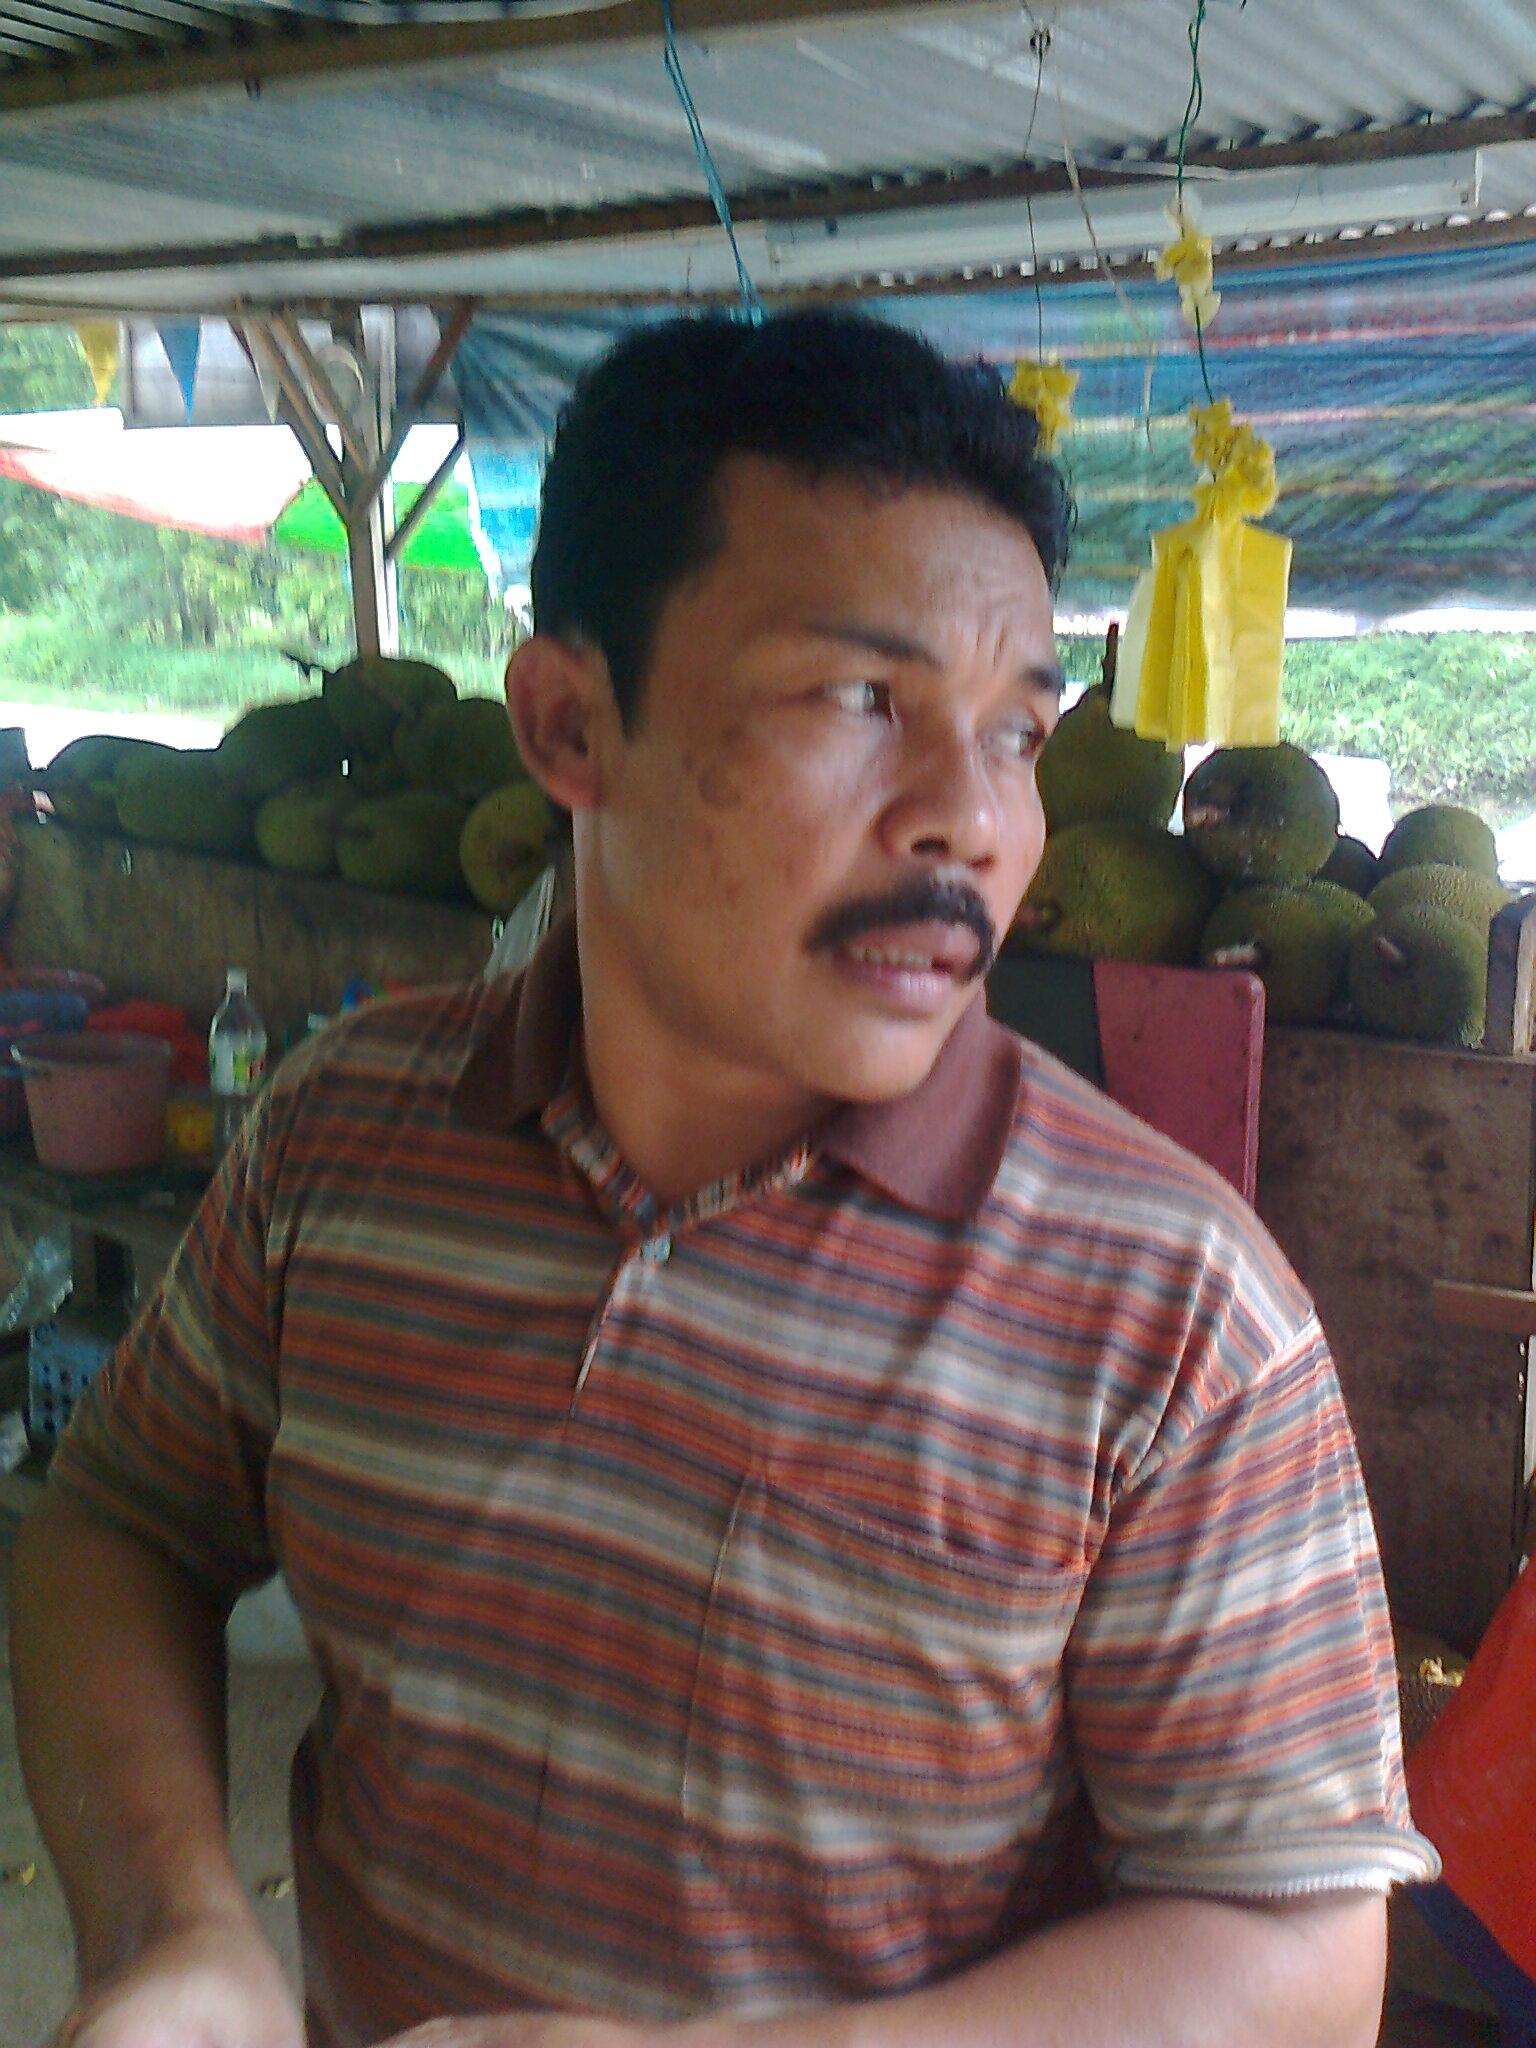 Inilah Kedie,pekerja gerai Nangka Madu 916 yang sangat rajin dan berdedikasi